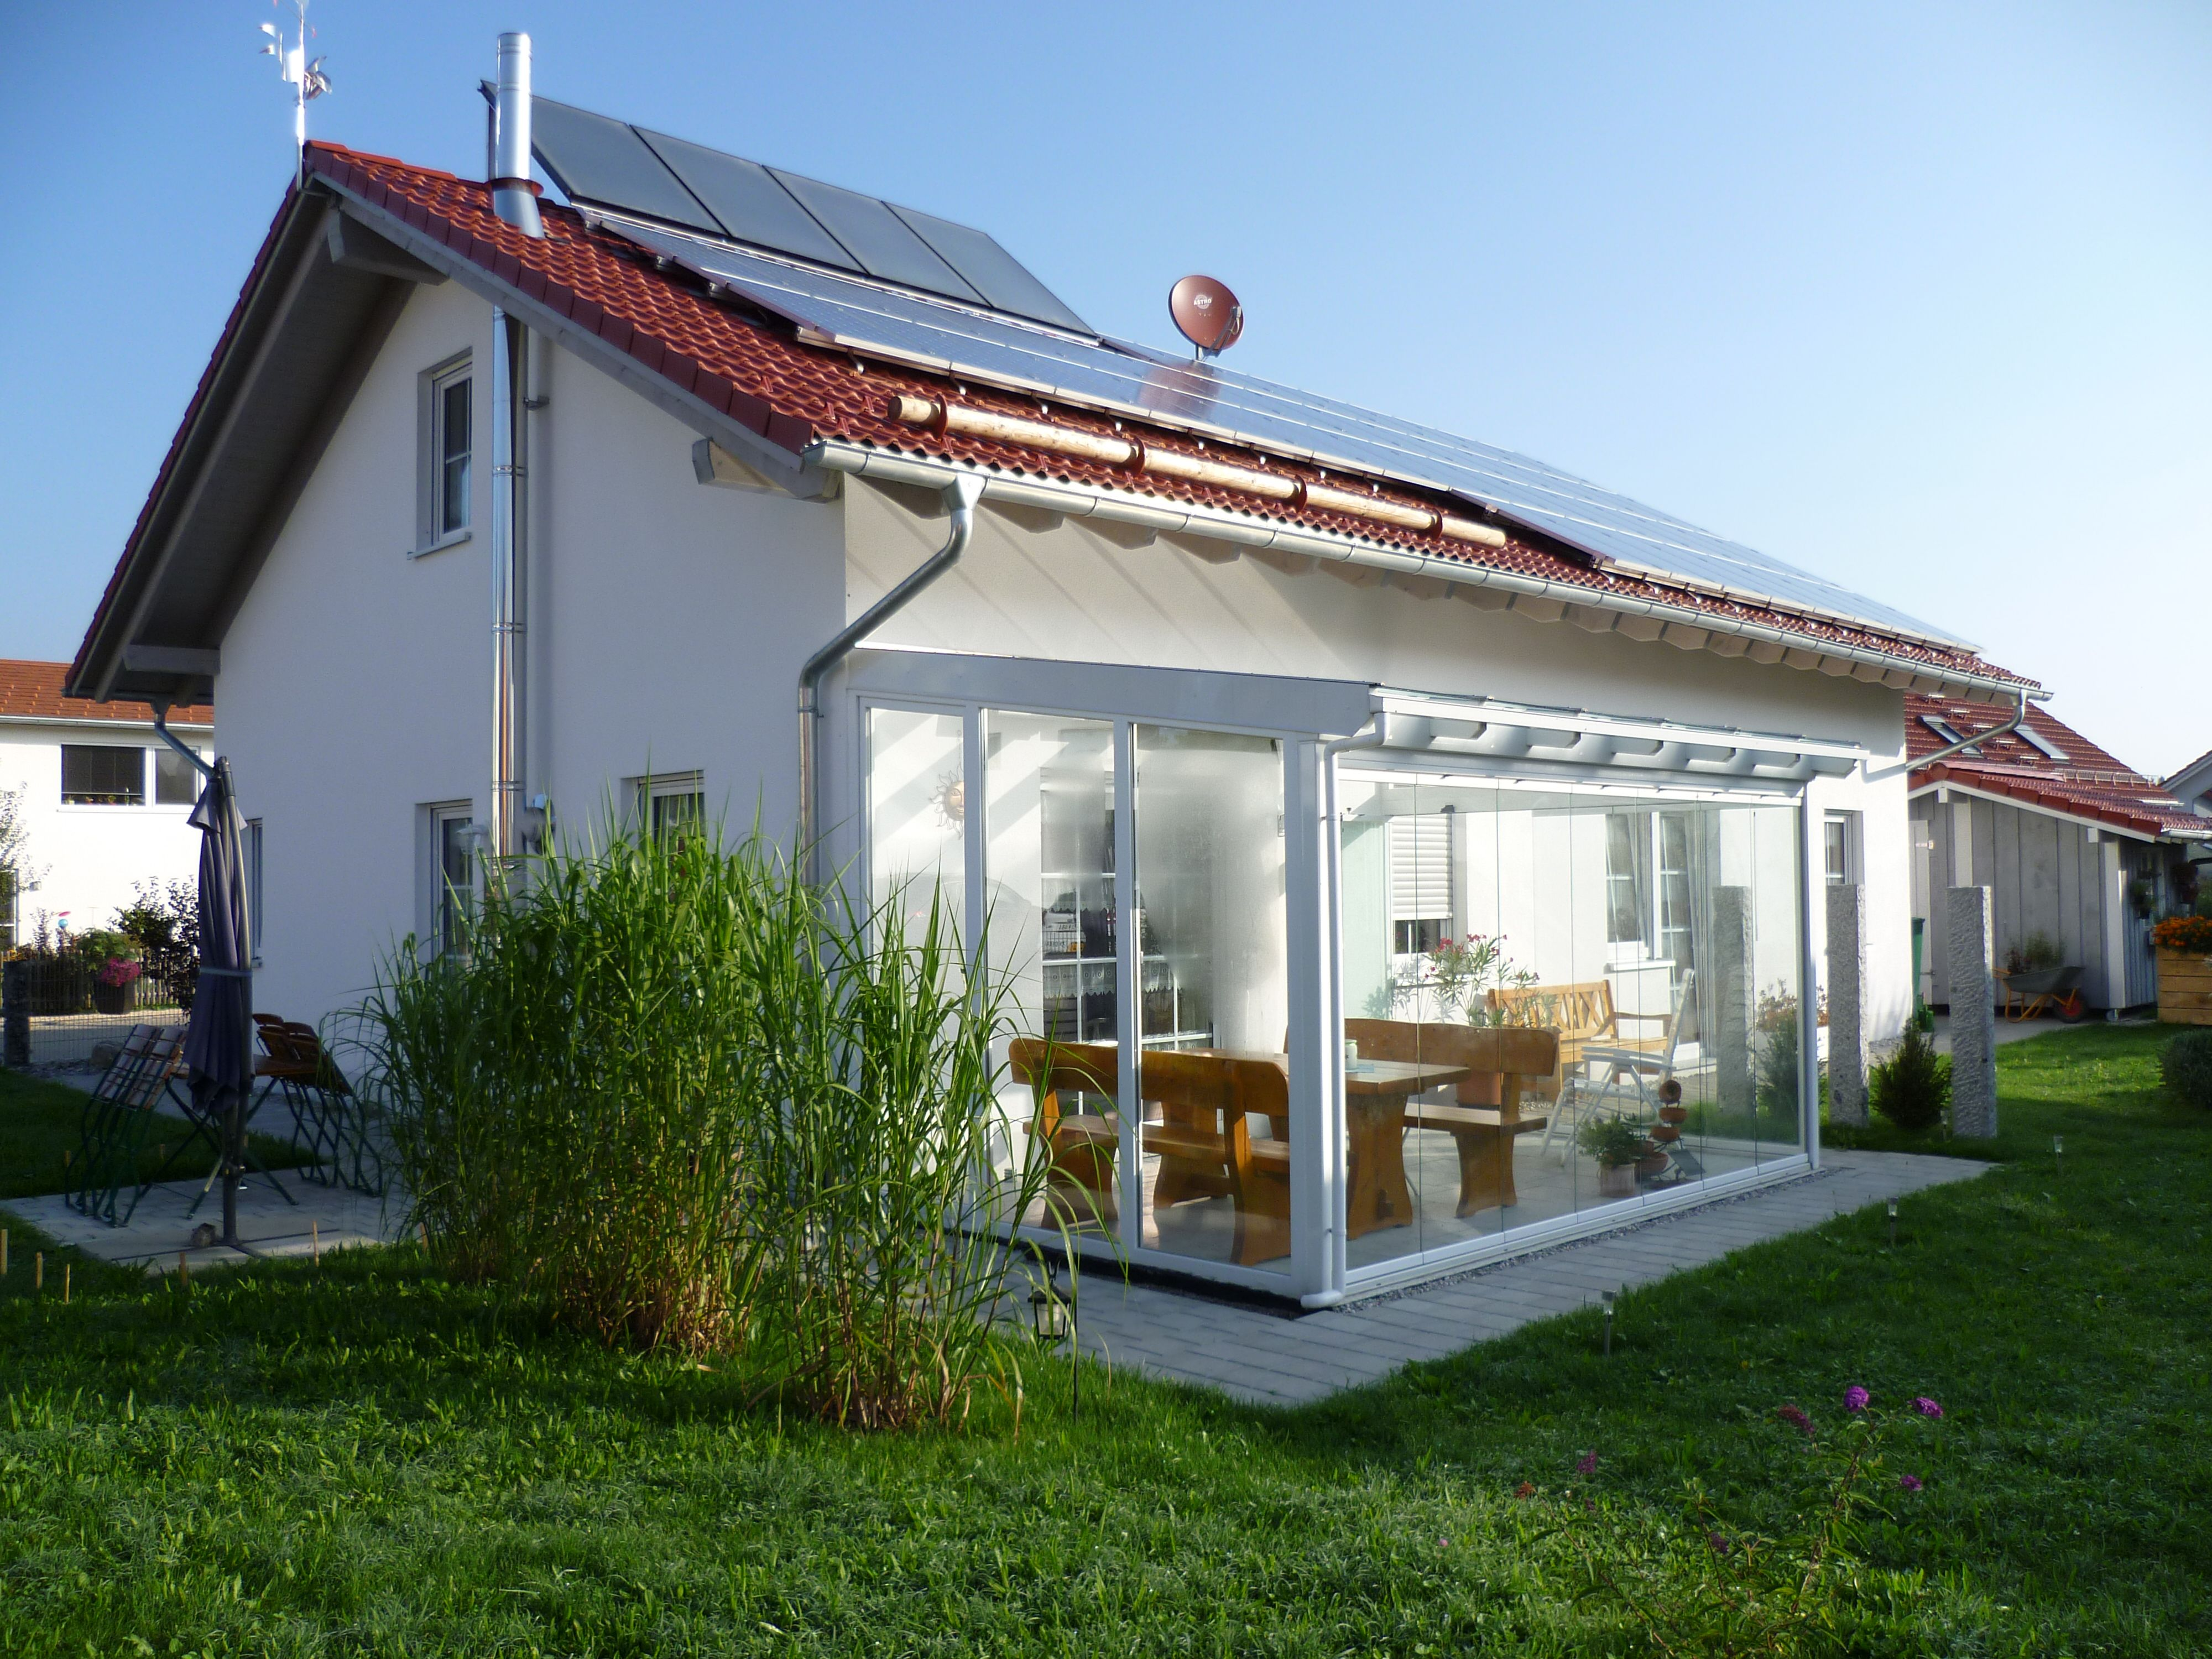 Go To Görsried Immobilien Immobilienmakler Einfamilienhaus